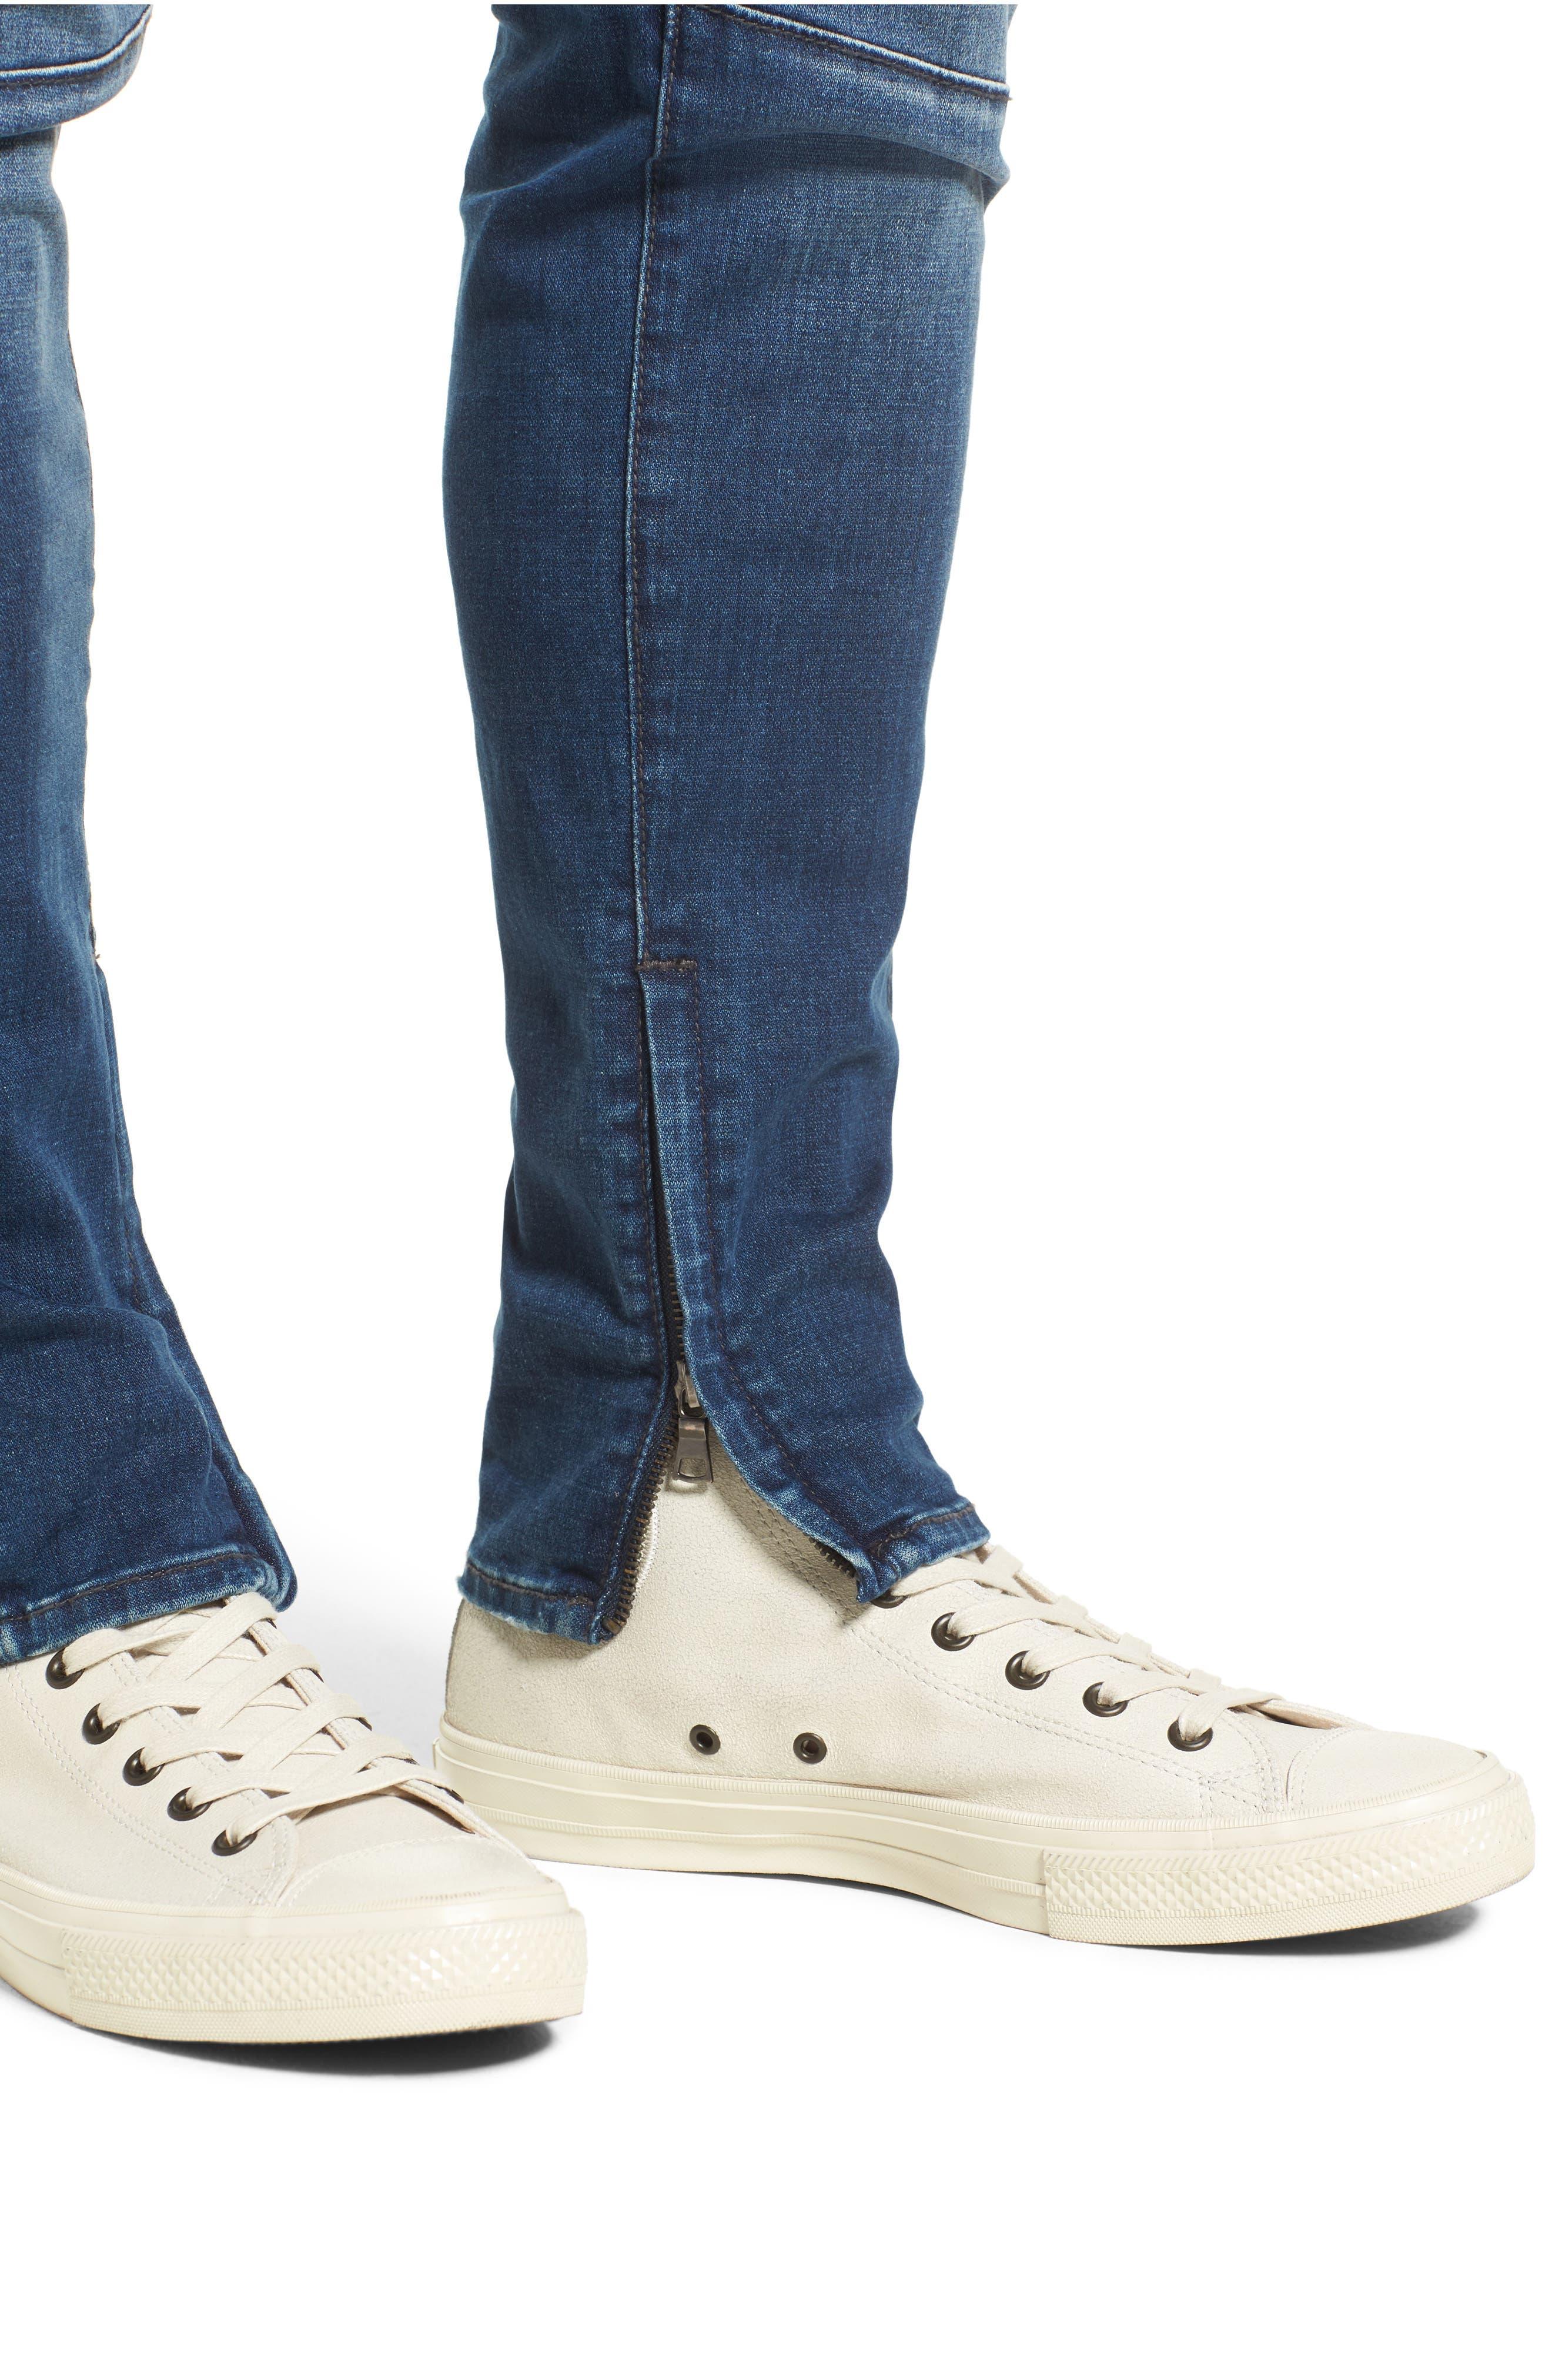 Racer Skinny Fit Jeans,                             Alternate thumbnail 4, color,                             WHISKEY BLUES